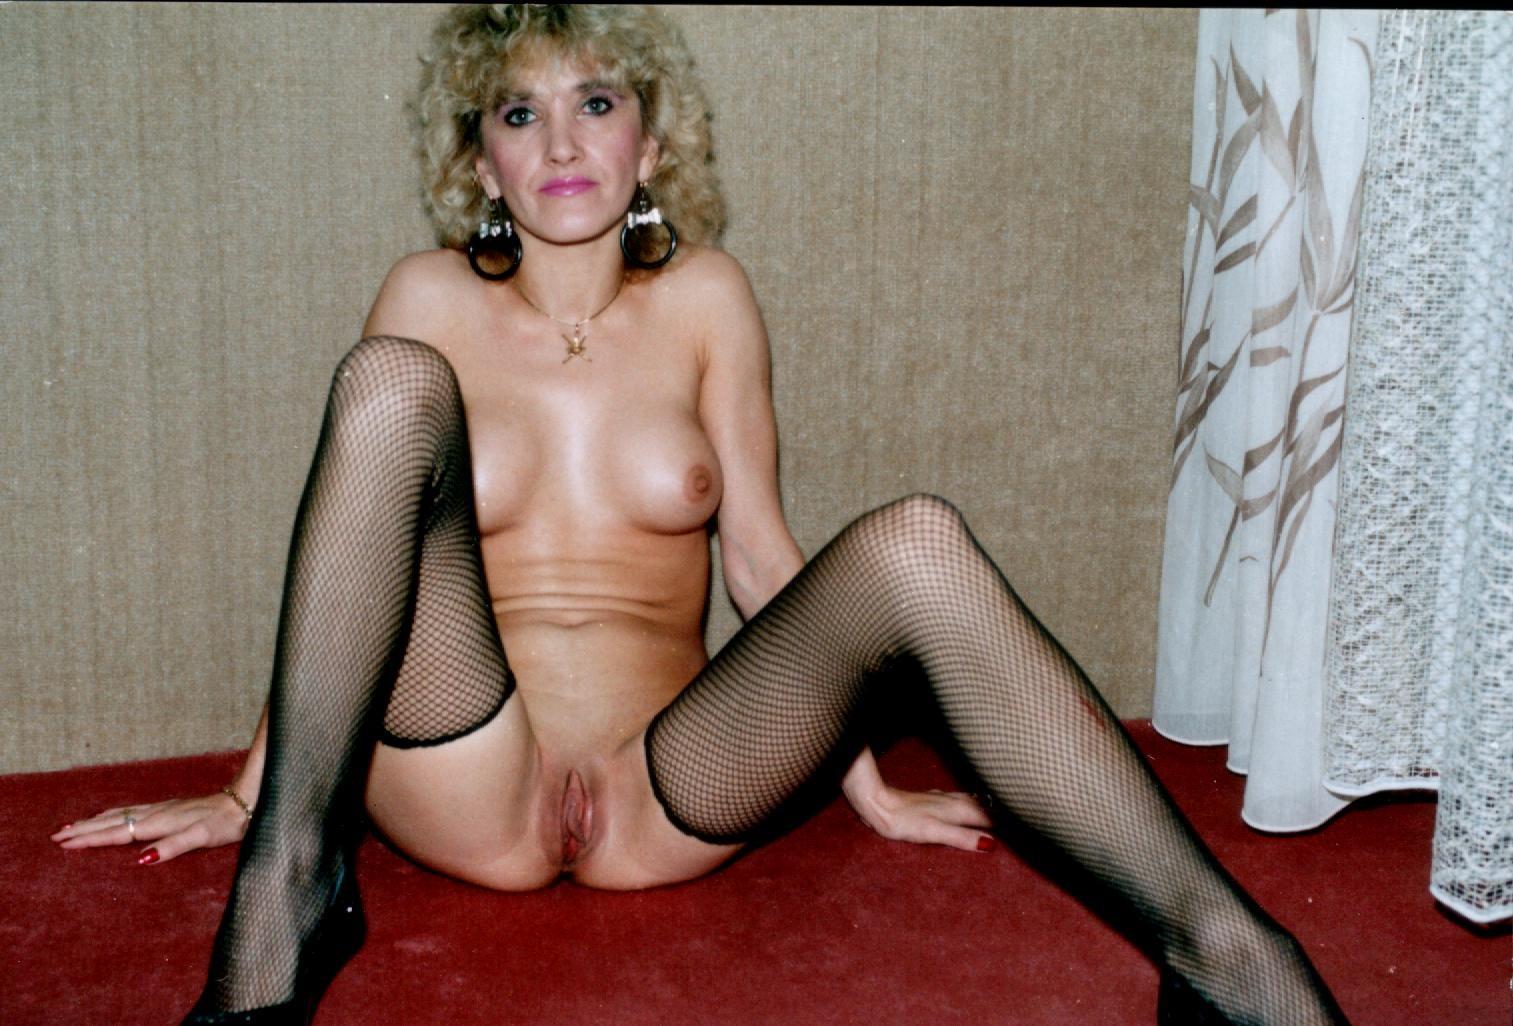 Nude amateurs gone wild